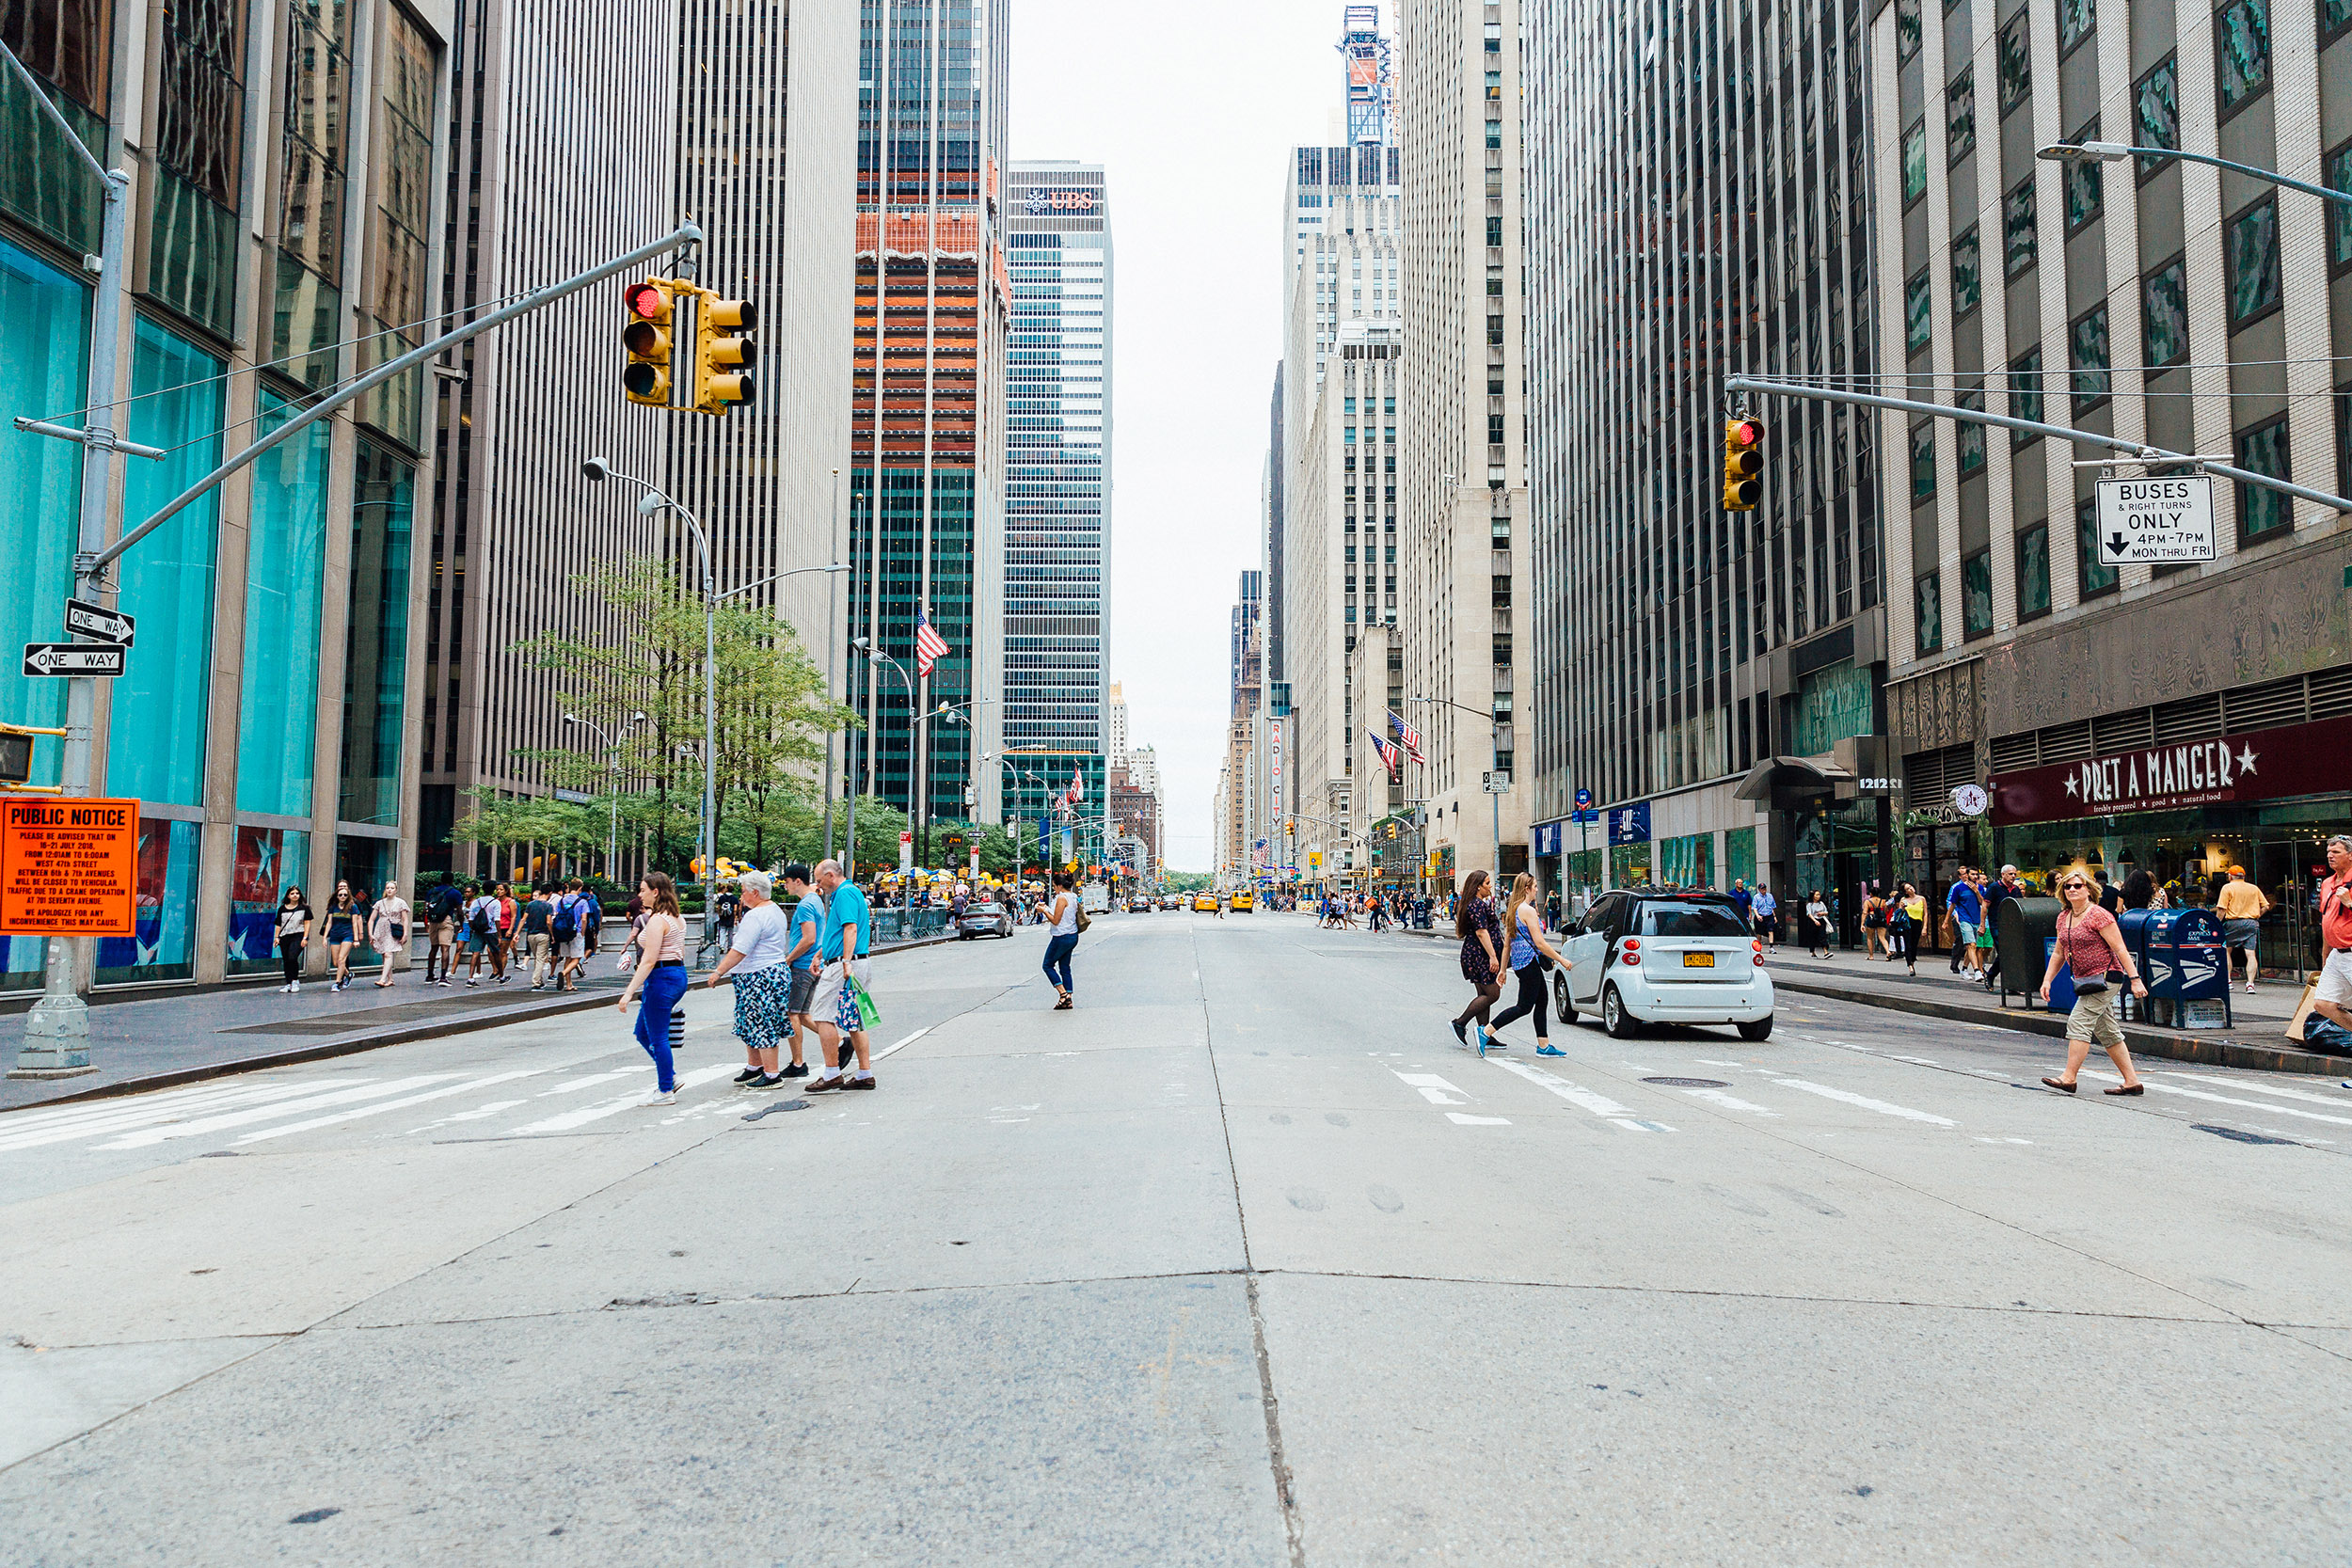 NYC_072018 (18 of 36).jpg